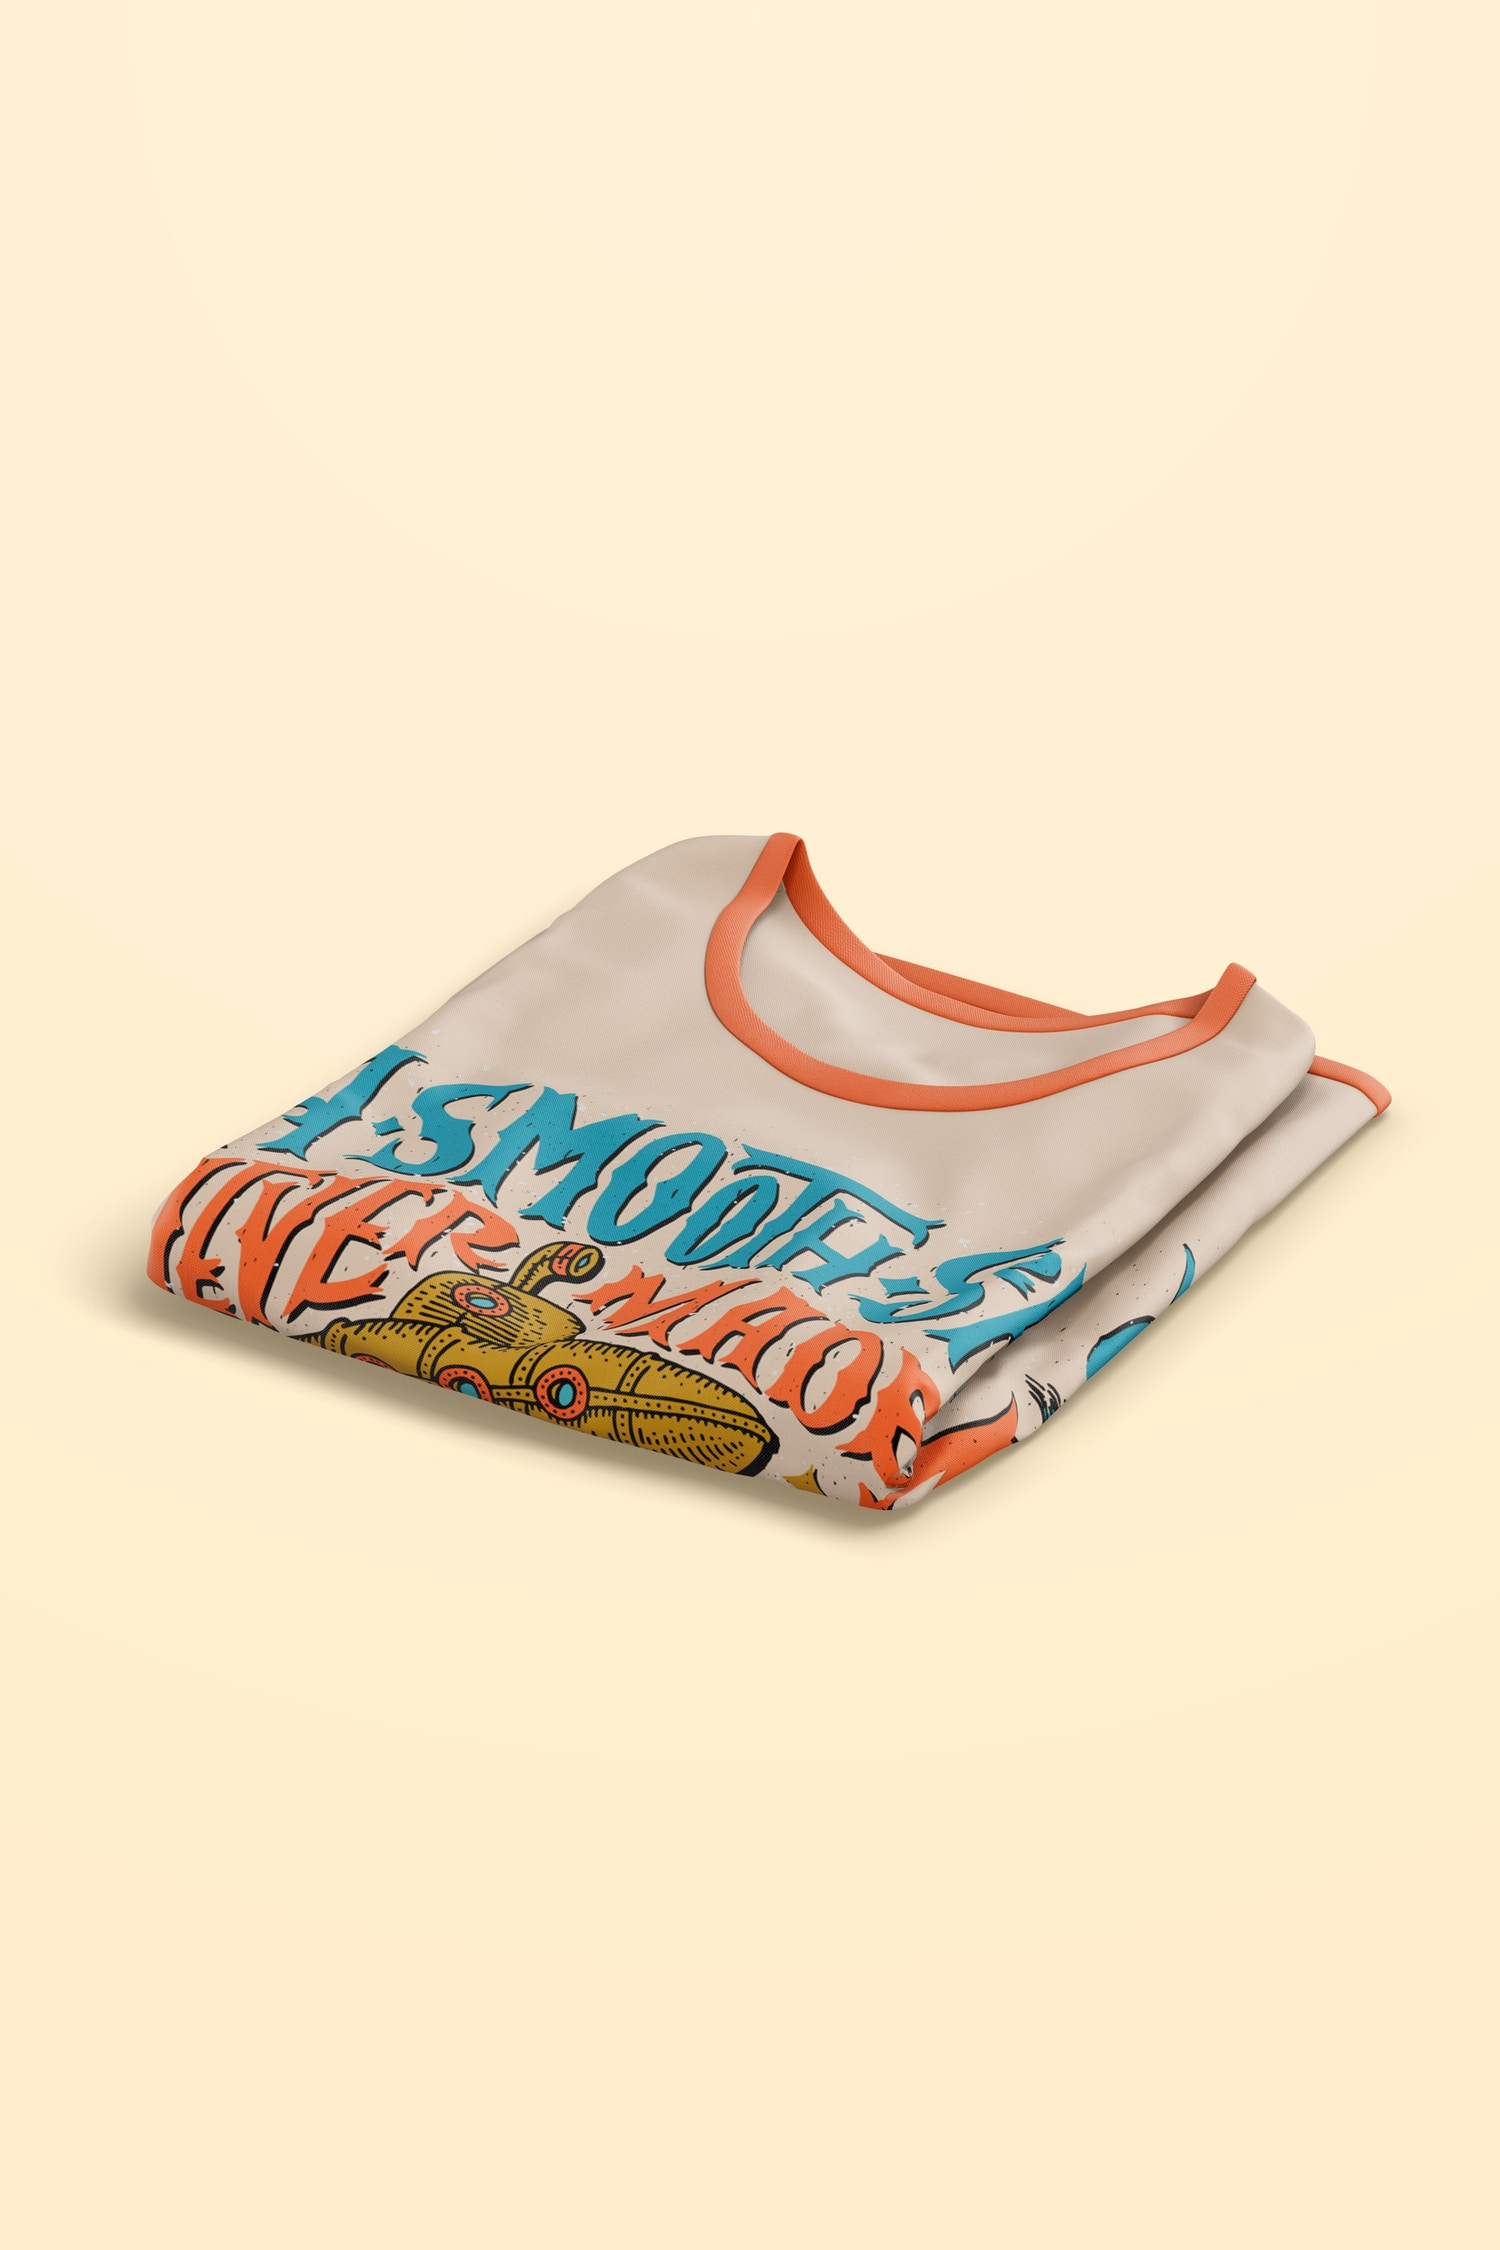 T-Shirt Mockup, Isometric View